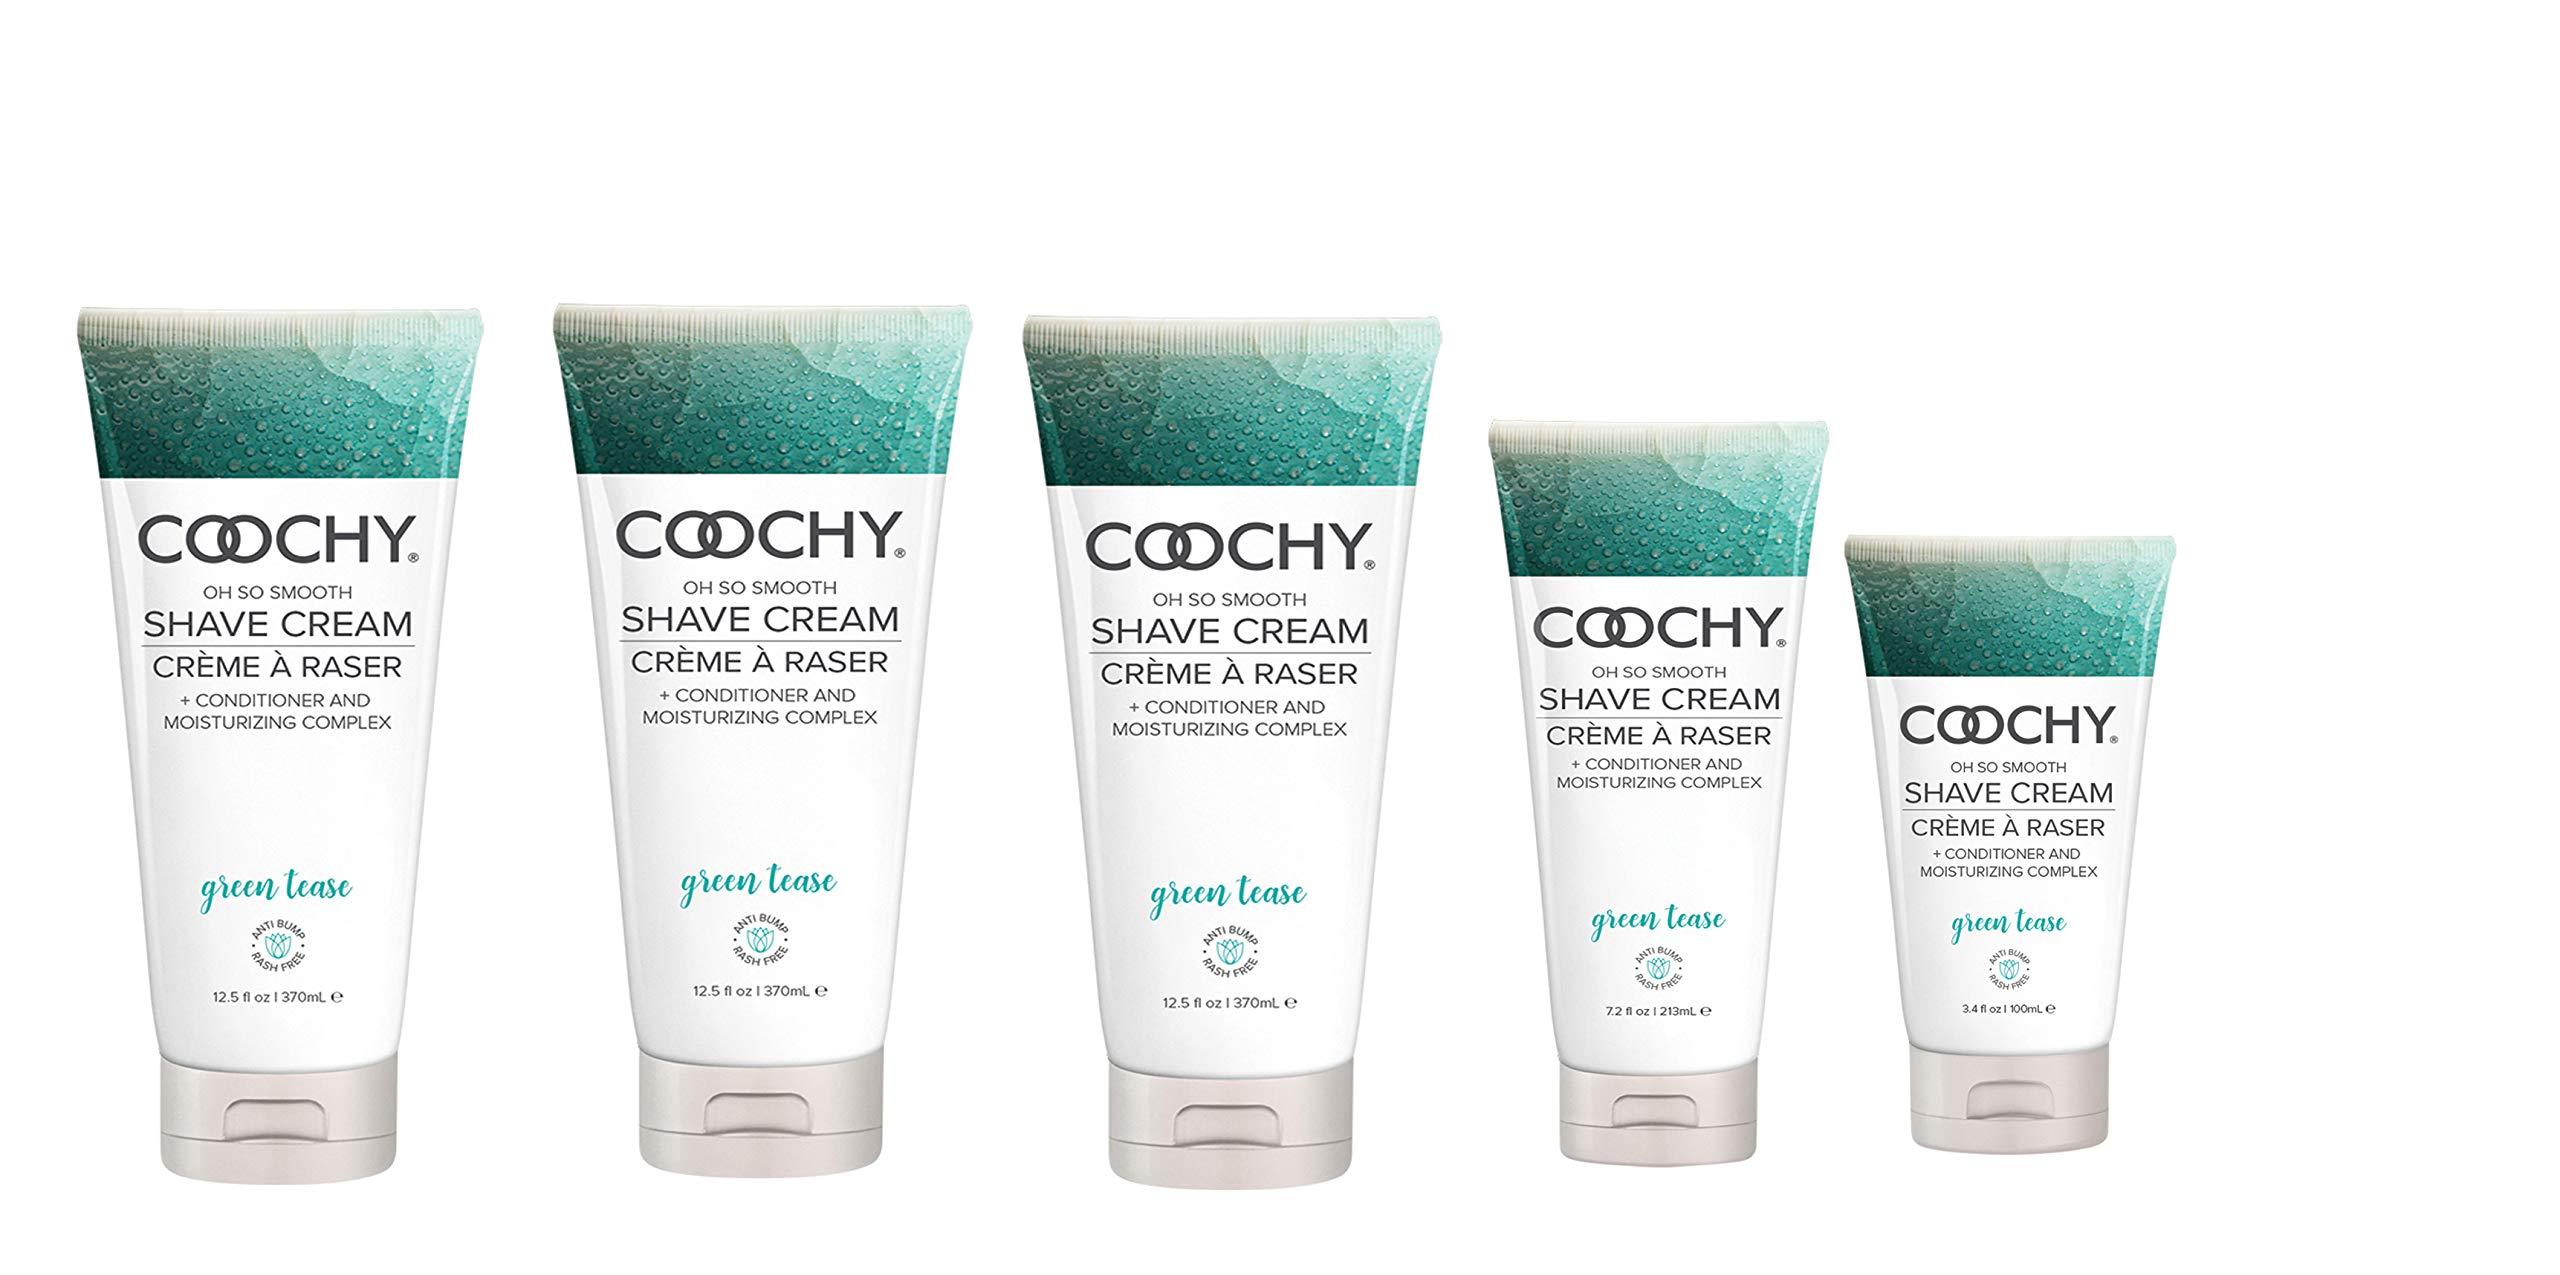 Coochy Rash-free Shave Creme Green Tea 16 Fl. Oz. 3-Pack